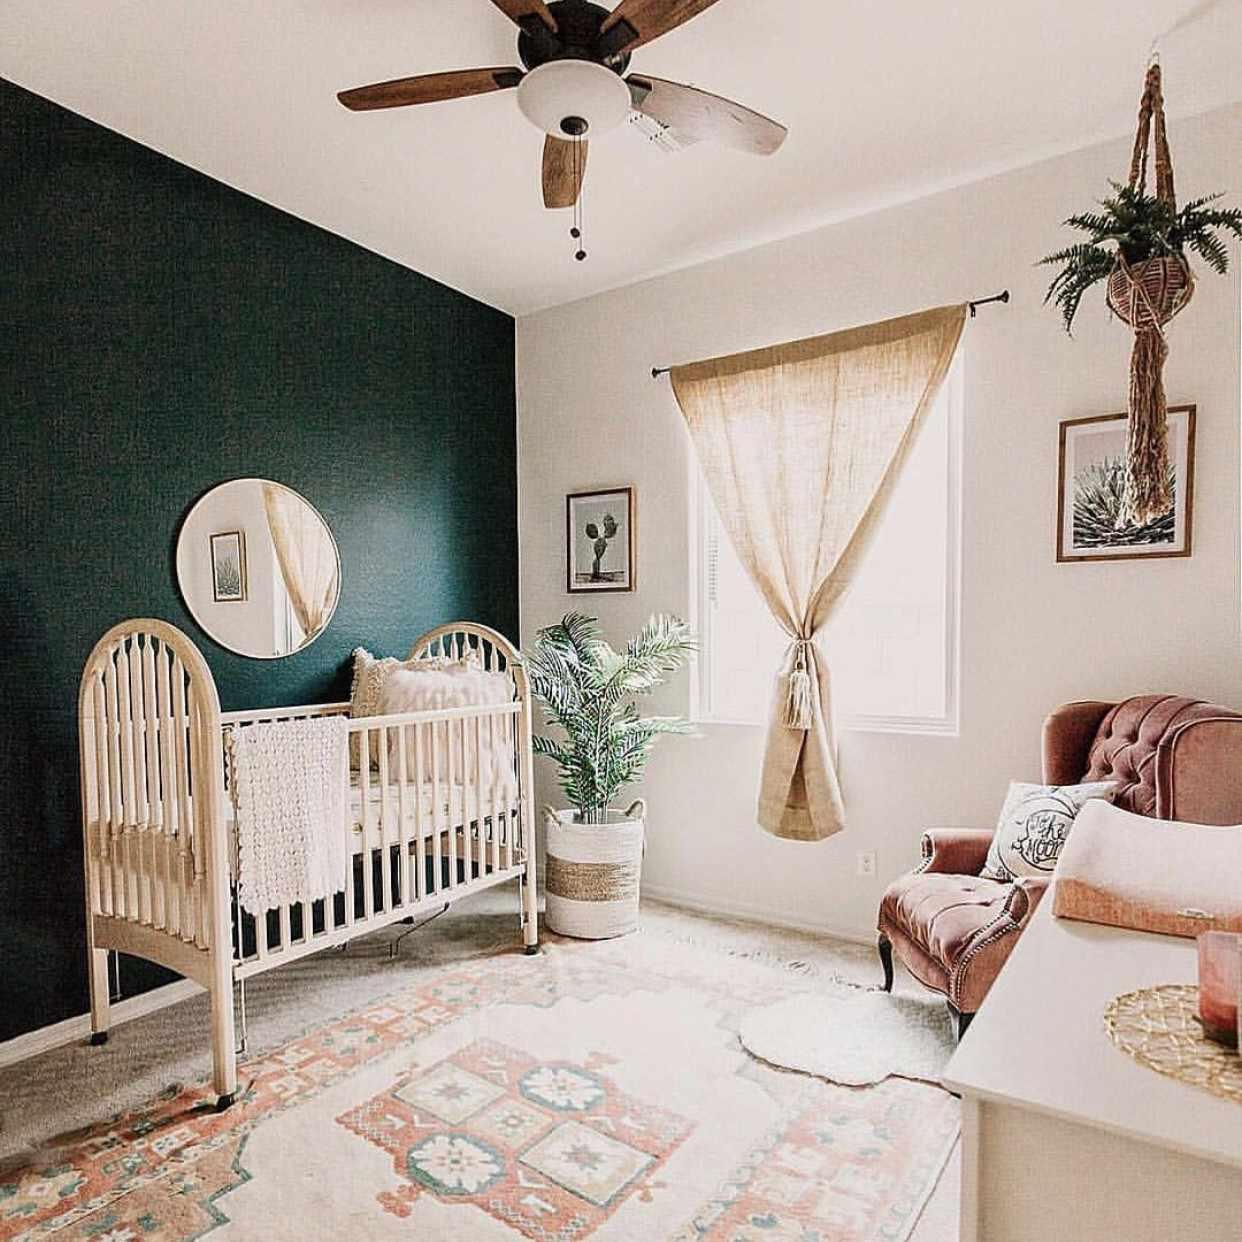 Green and earthy nursery with Southwestern, boho feel